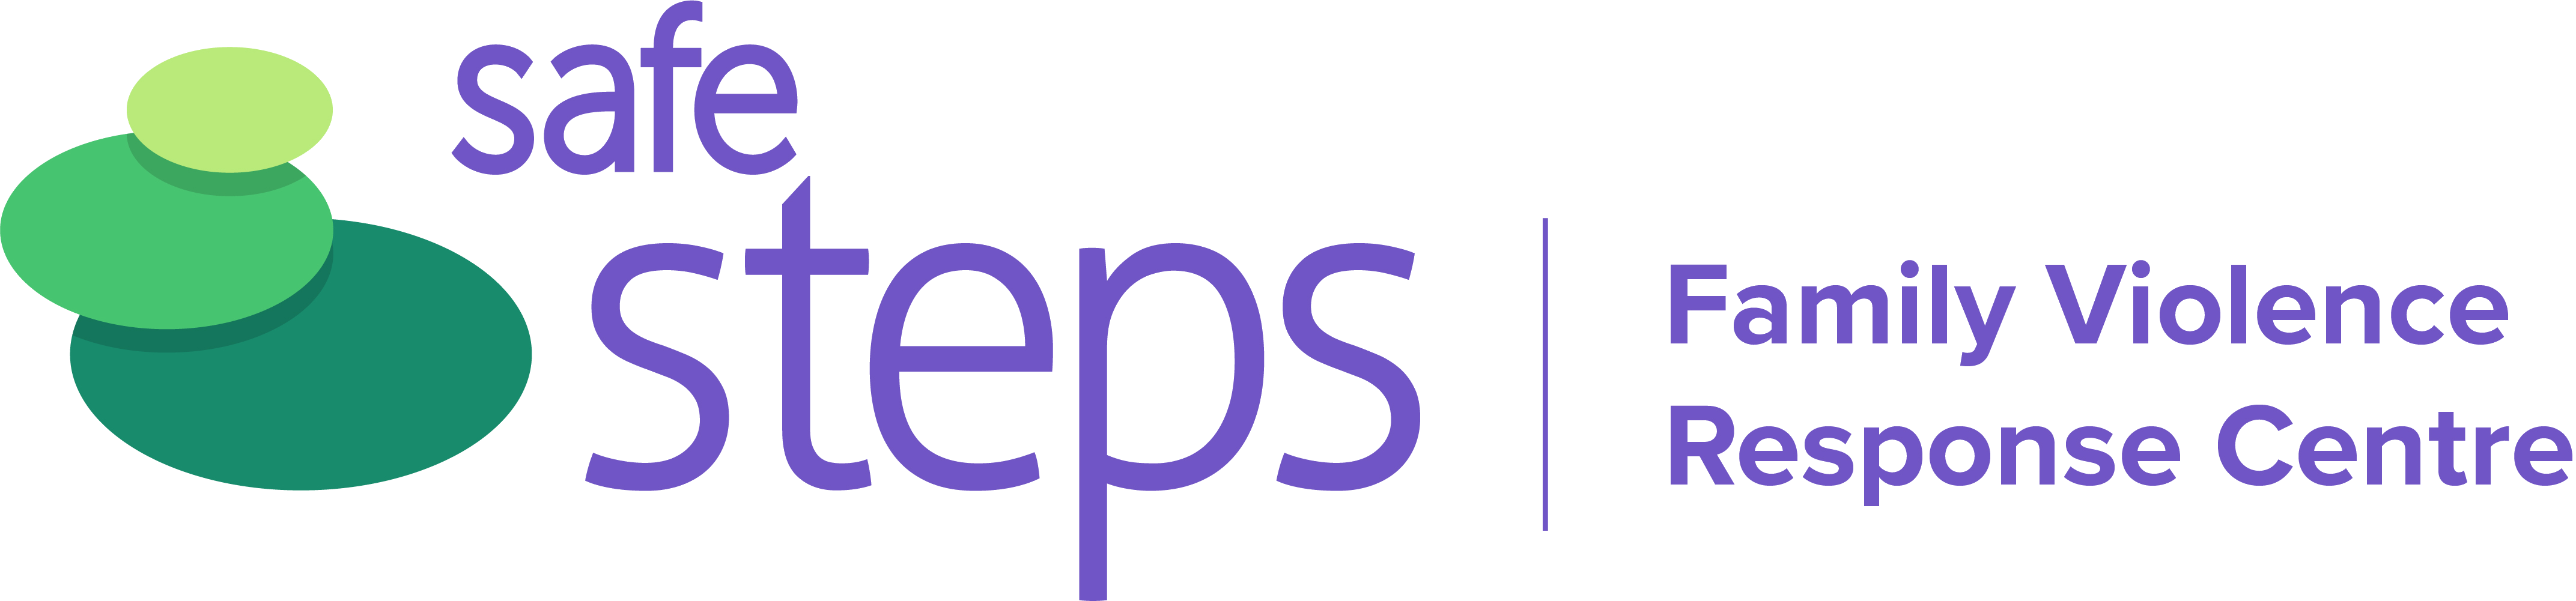 Safe Steps Family Violence Response Centre